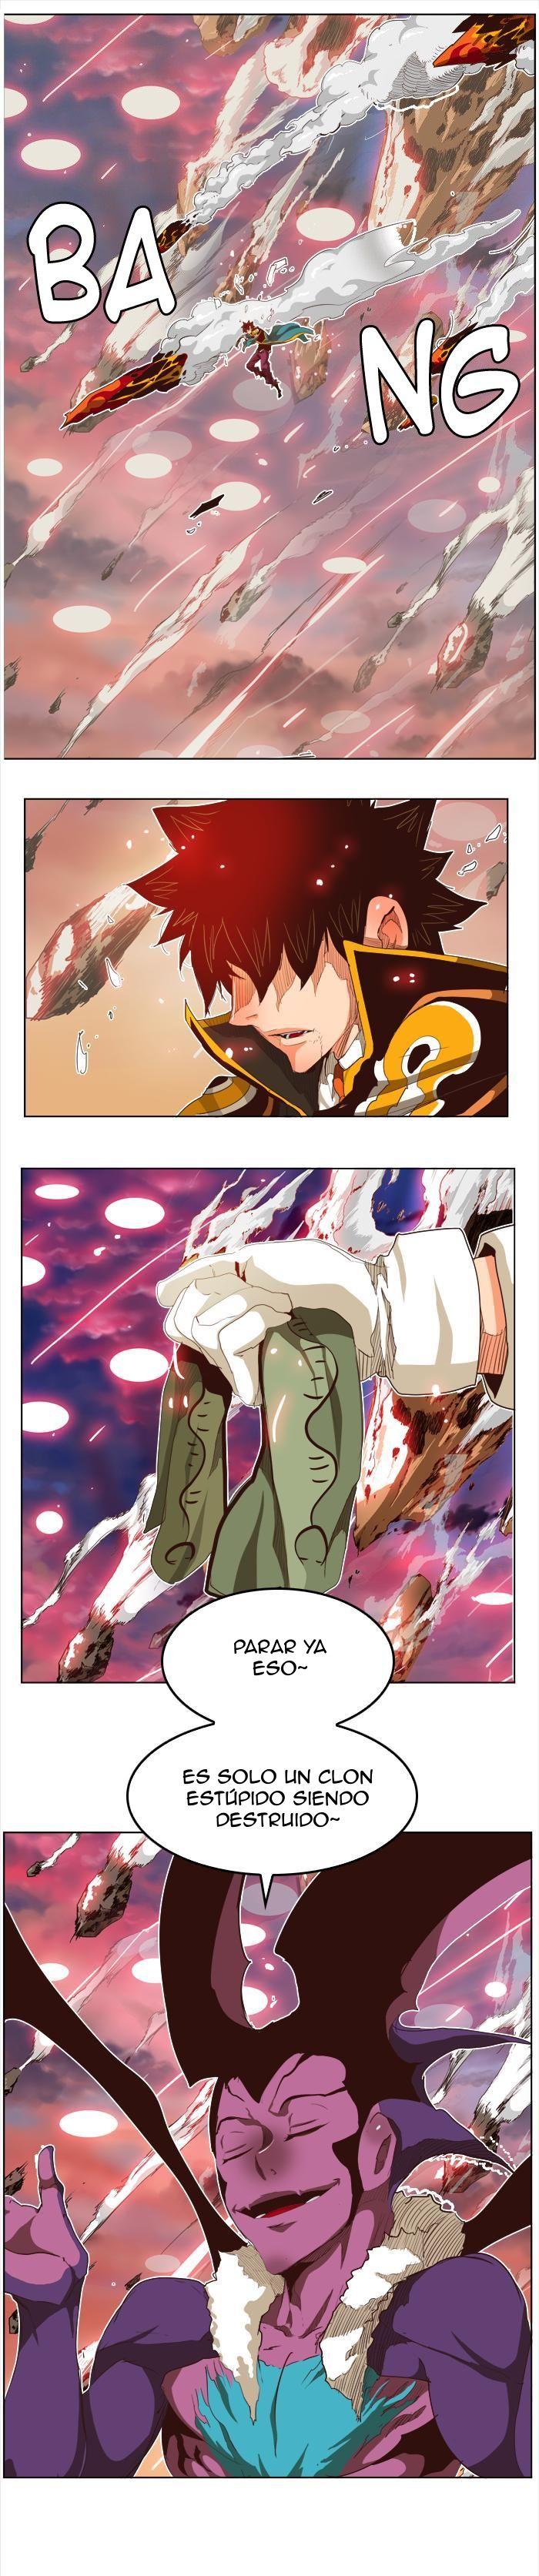 http://c5.ninemanga.com/es_manga/pic2/37/485/523386/3505514e9f9ba3724fc51cb3278e0e67.jpg Page 4